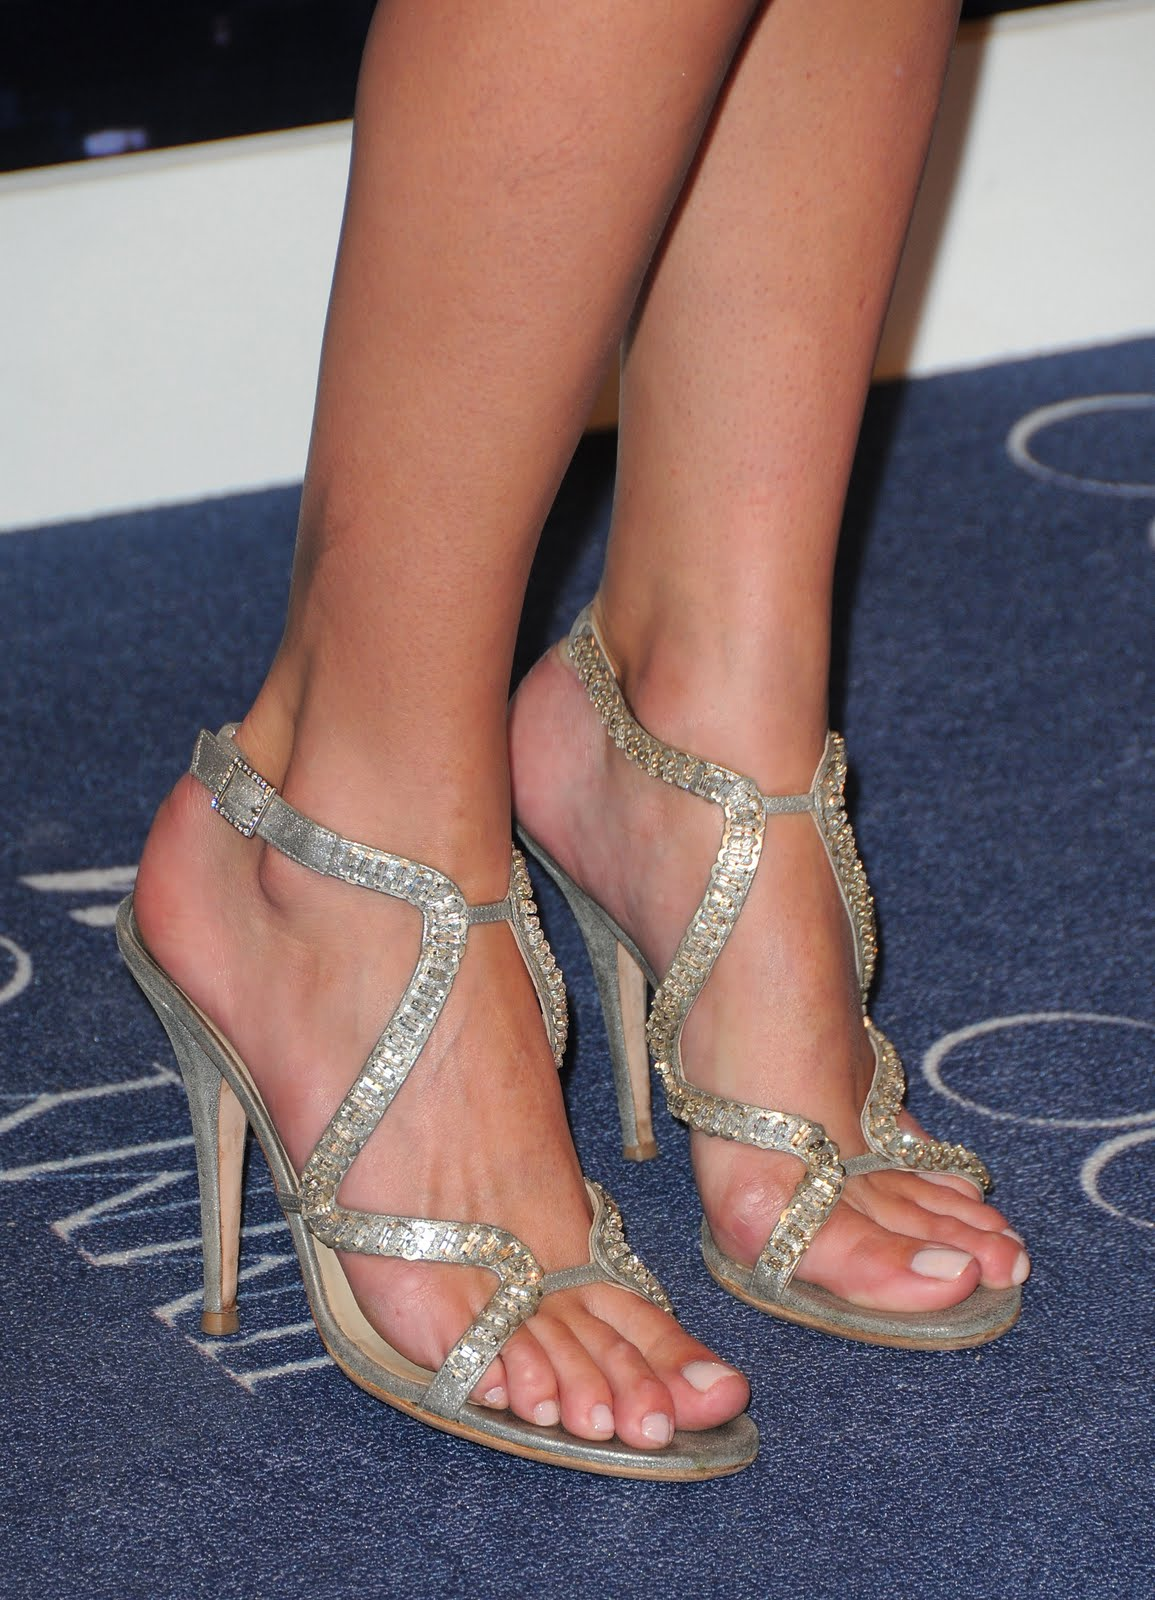 http://4.bp.blogspot.com/_UaLWp72nij4/TBqEYsiR8vI/AAAAAAAAPT4/1BbsJZ7XDR0/s1600/nicky-hilton-feet-5.jpg